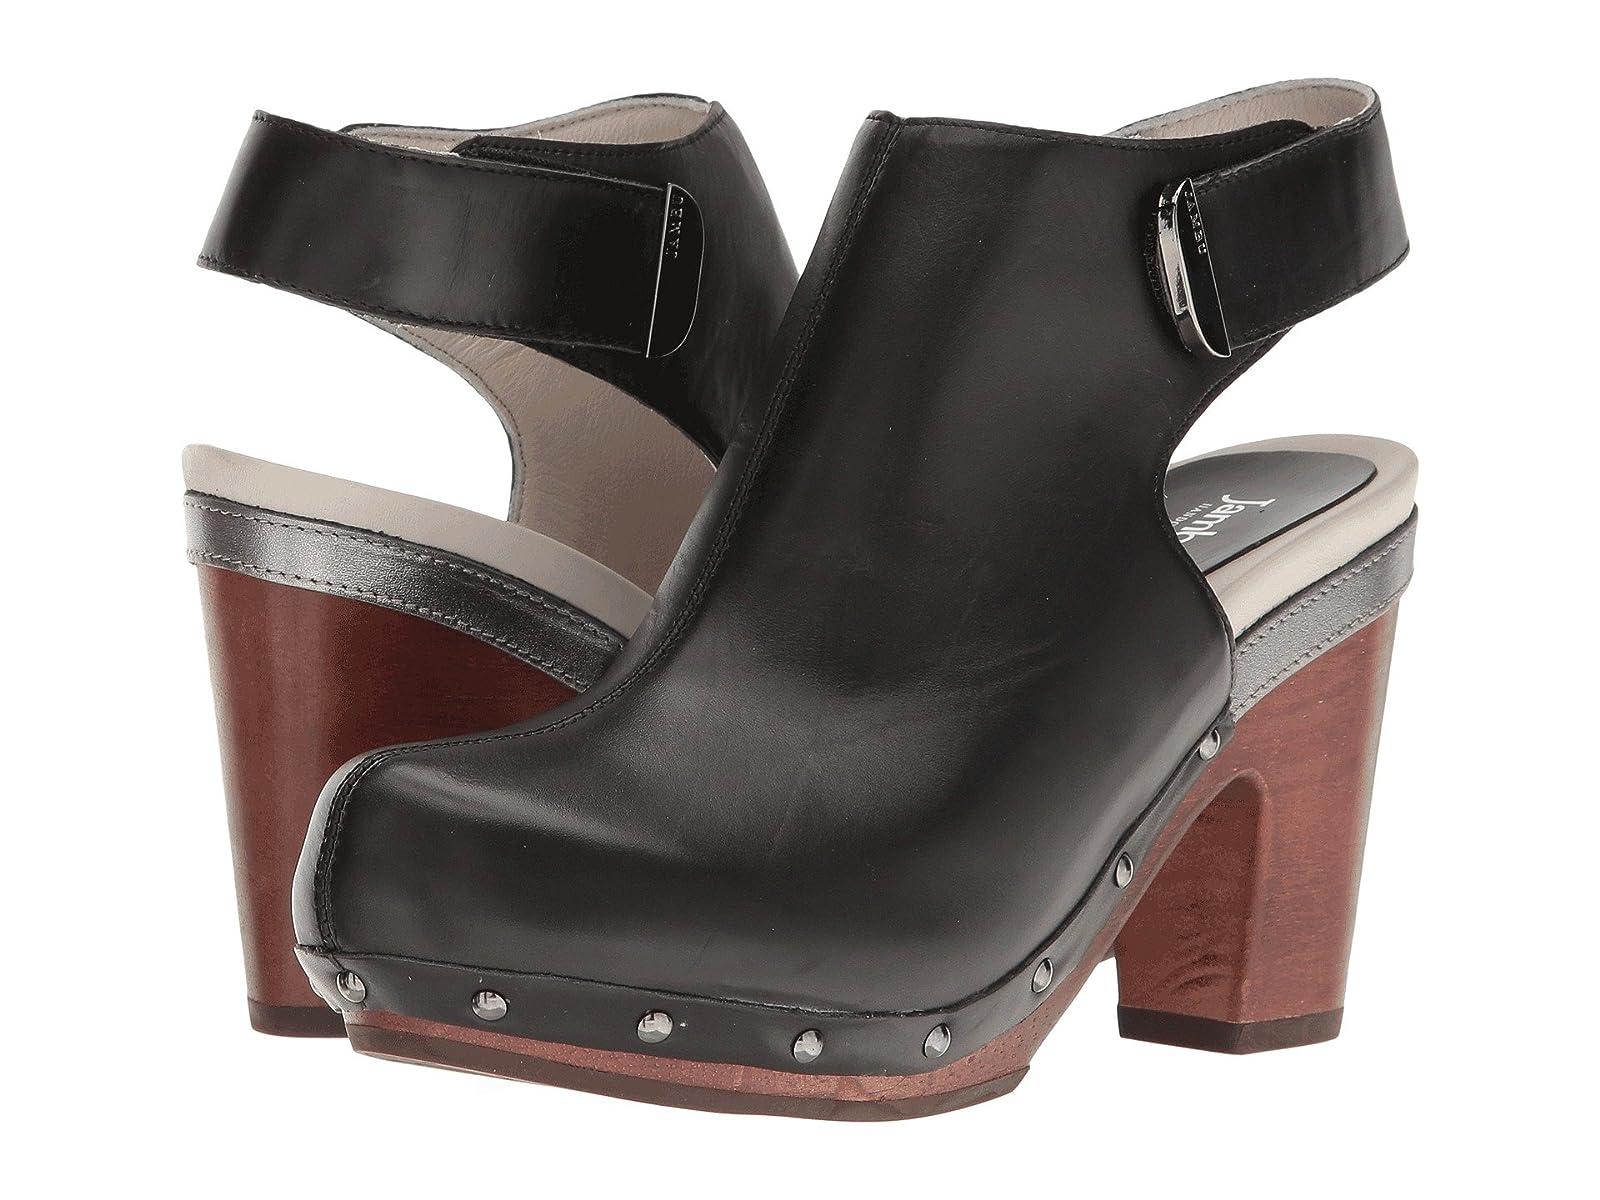 Jambu ColletteCheap and distinctive eye-catching shoes